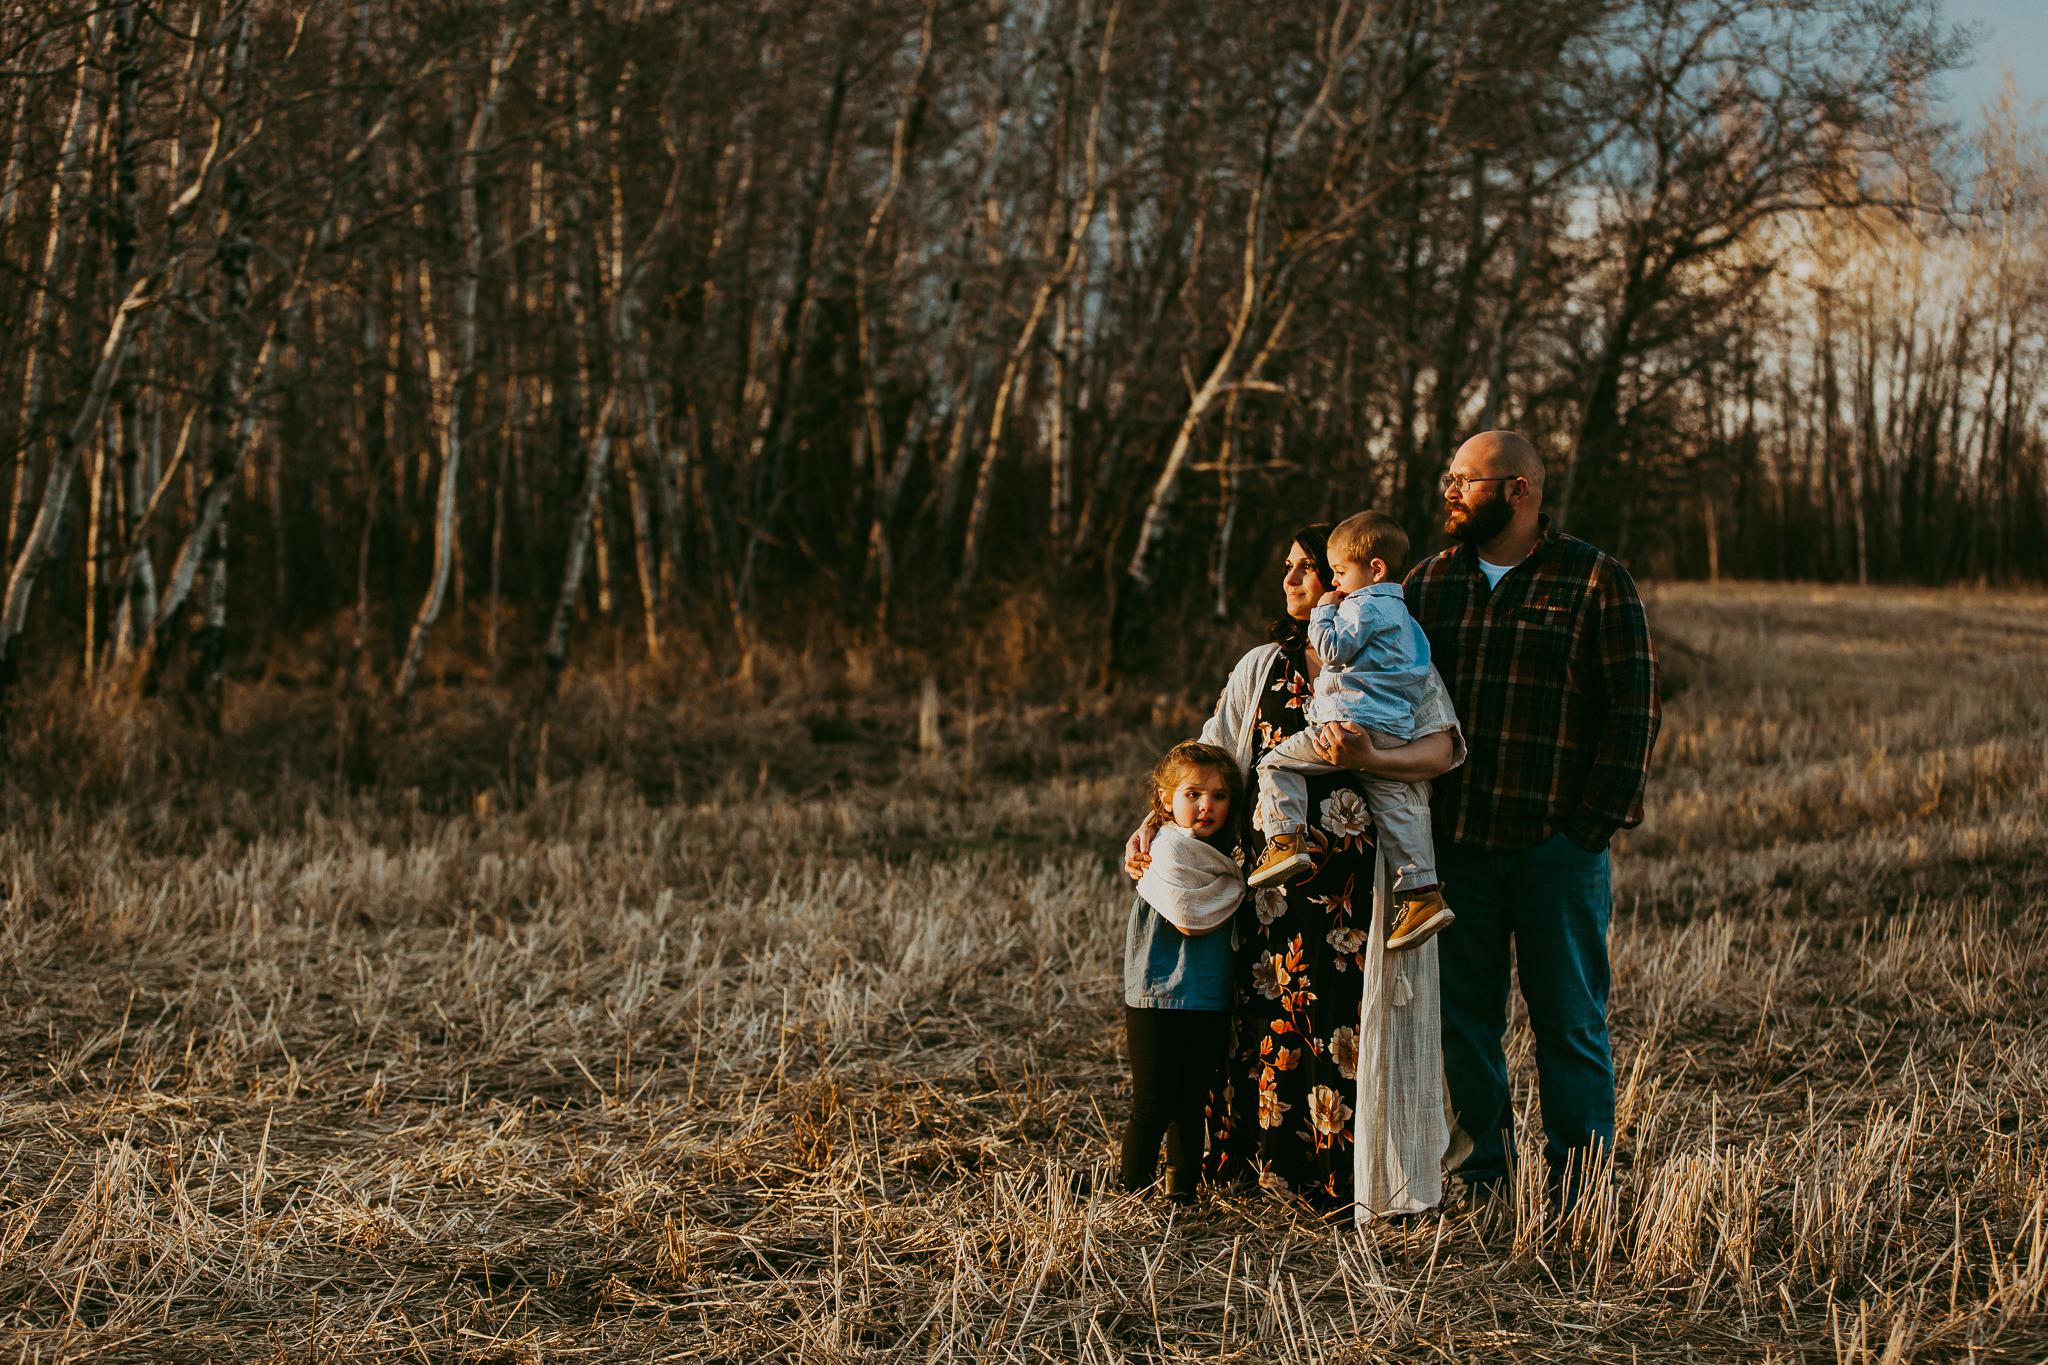 Alina-Joy-Photography-Cold-Lake-Maternity-Photographer-Josee-43.jpg